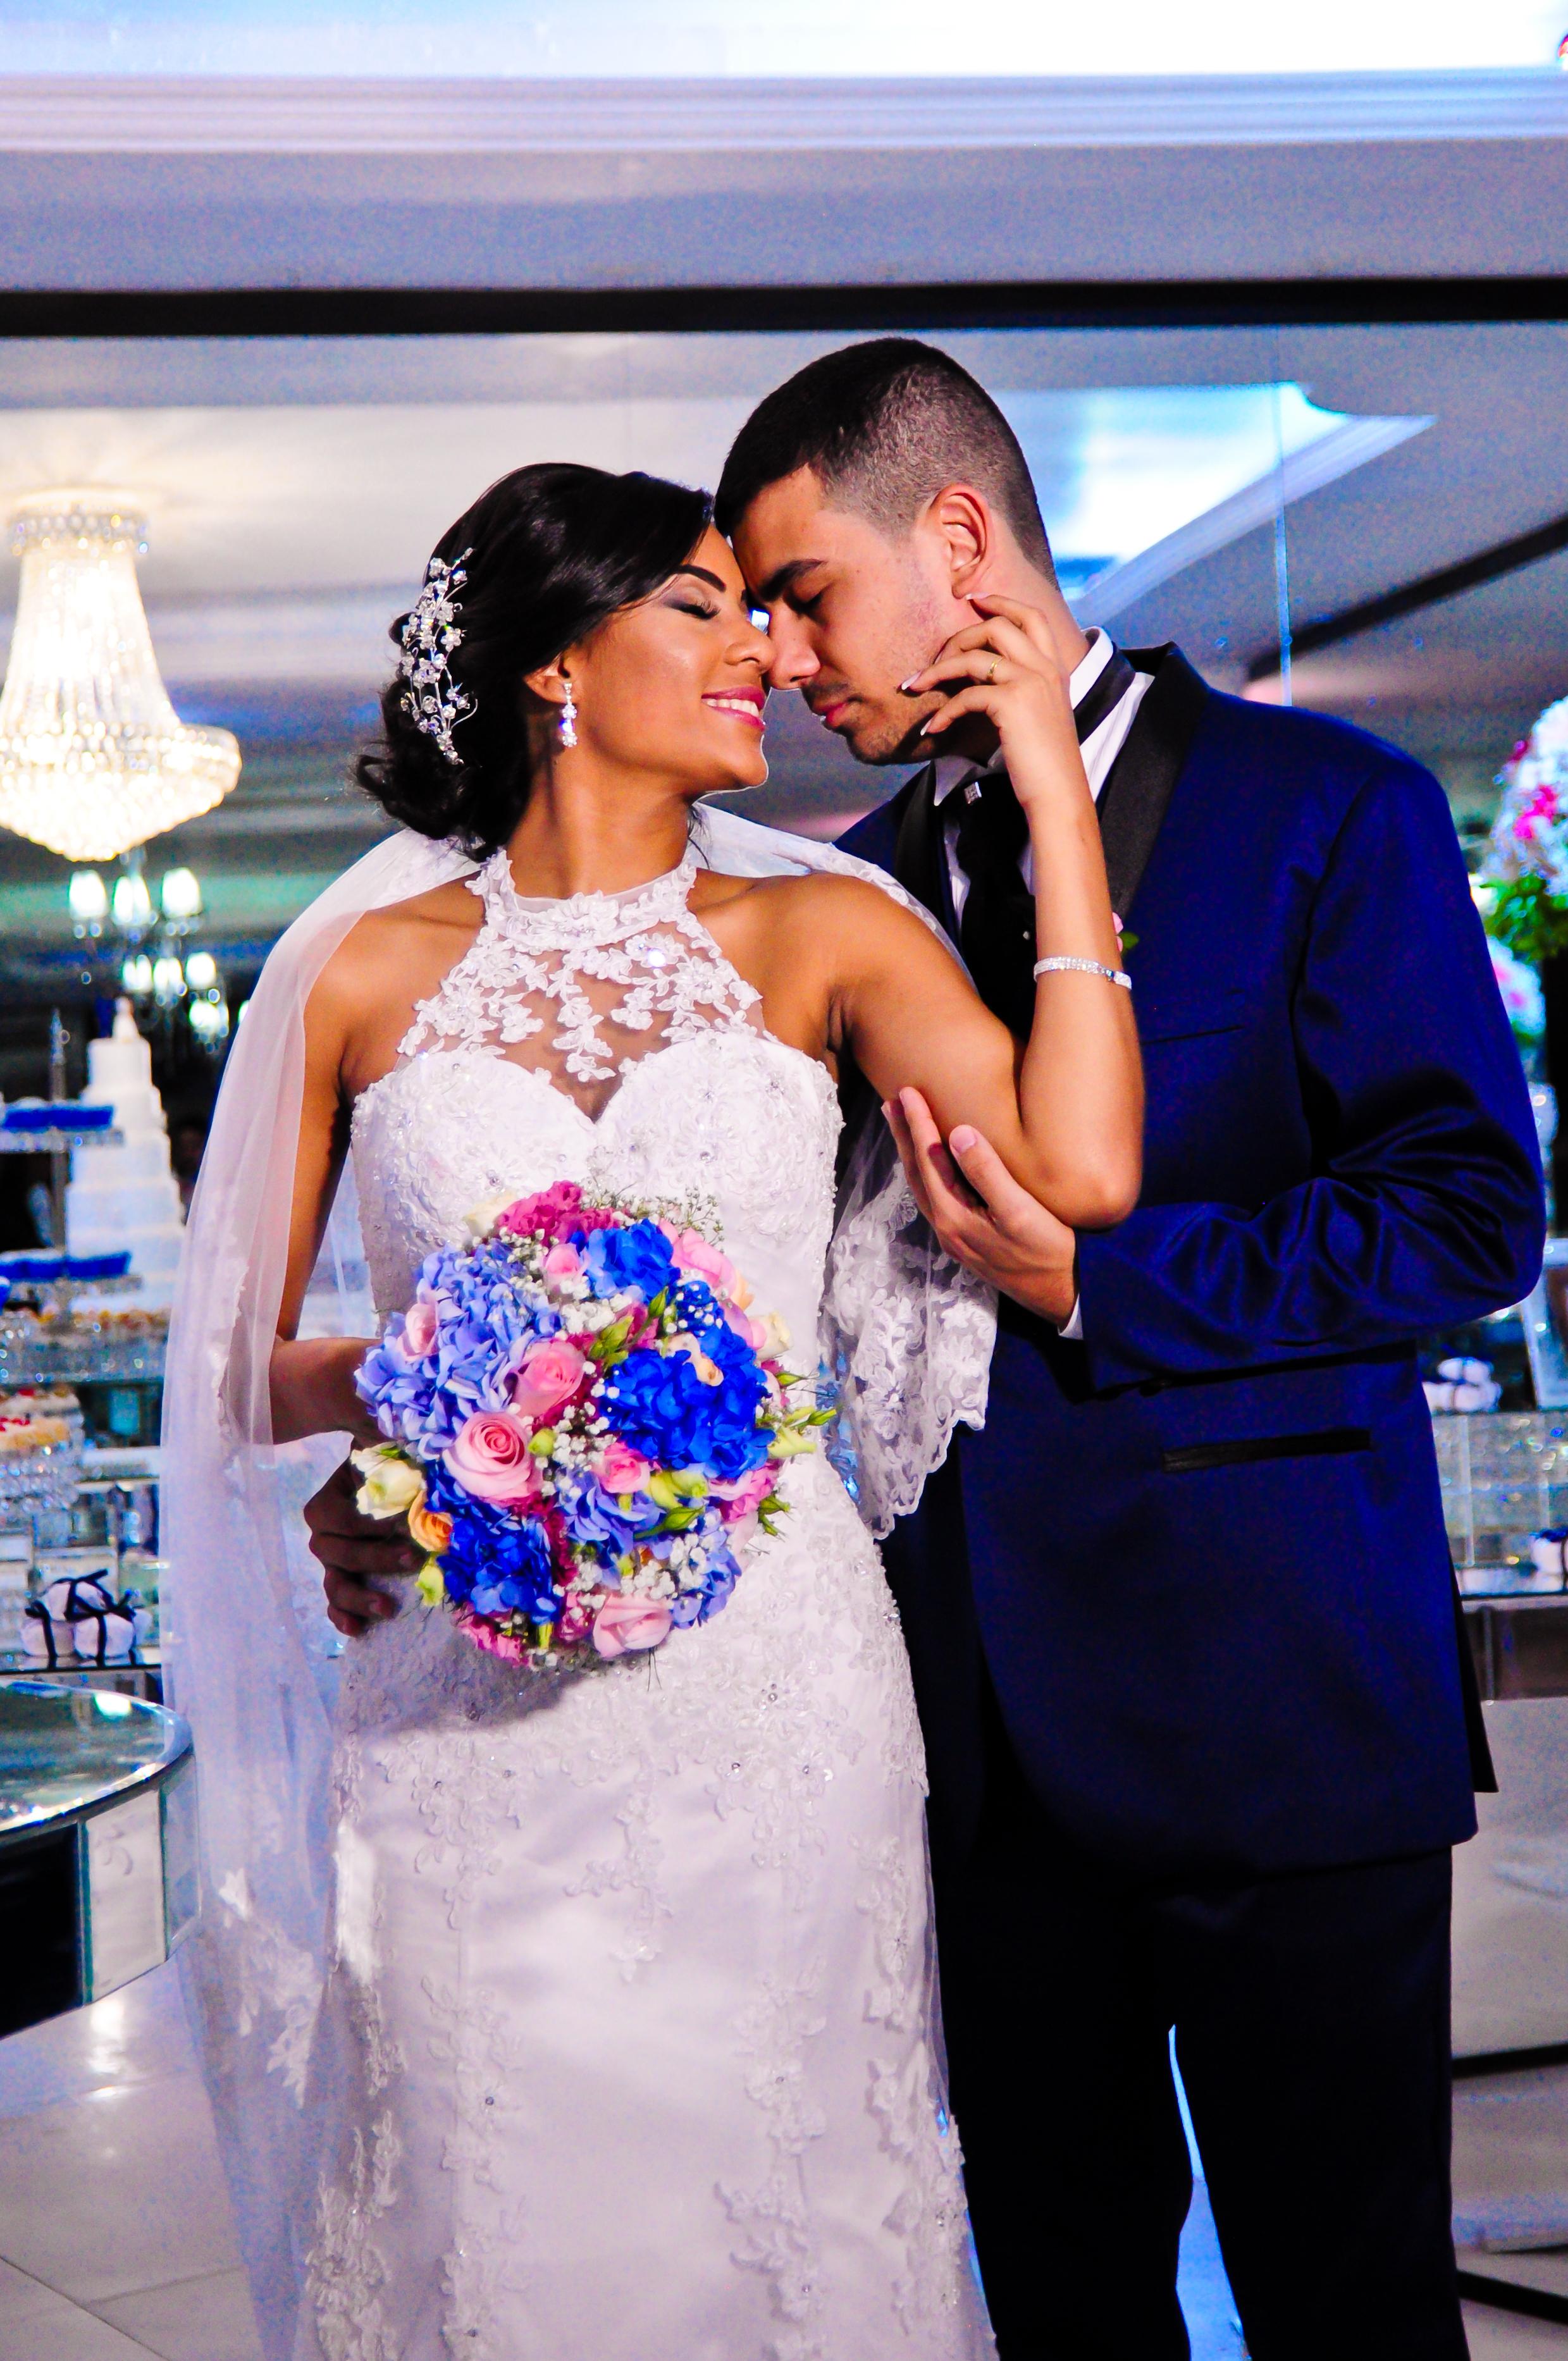 Free Images : bride, parties, blue, gown, woman, photograph, bridal ...